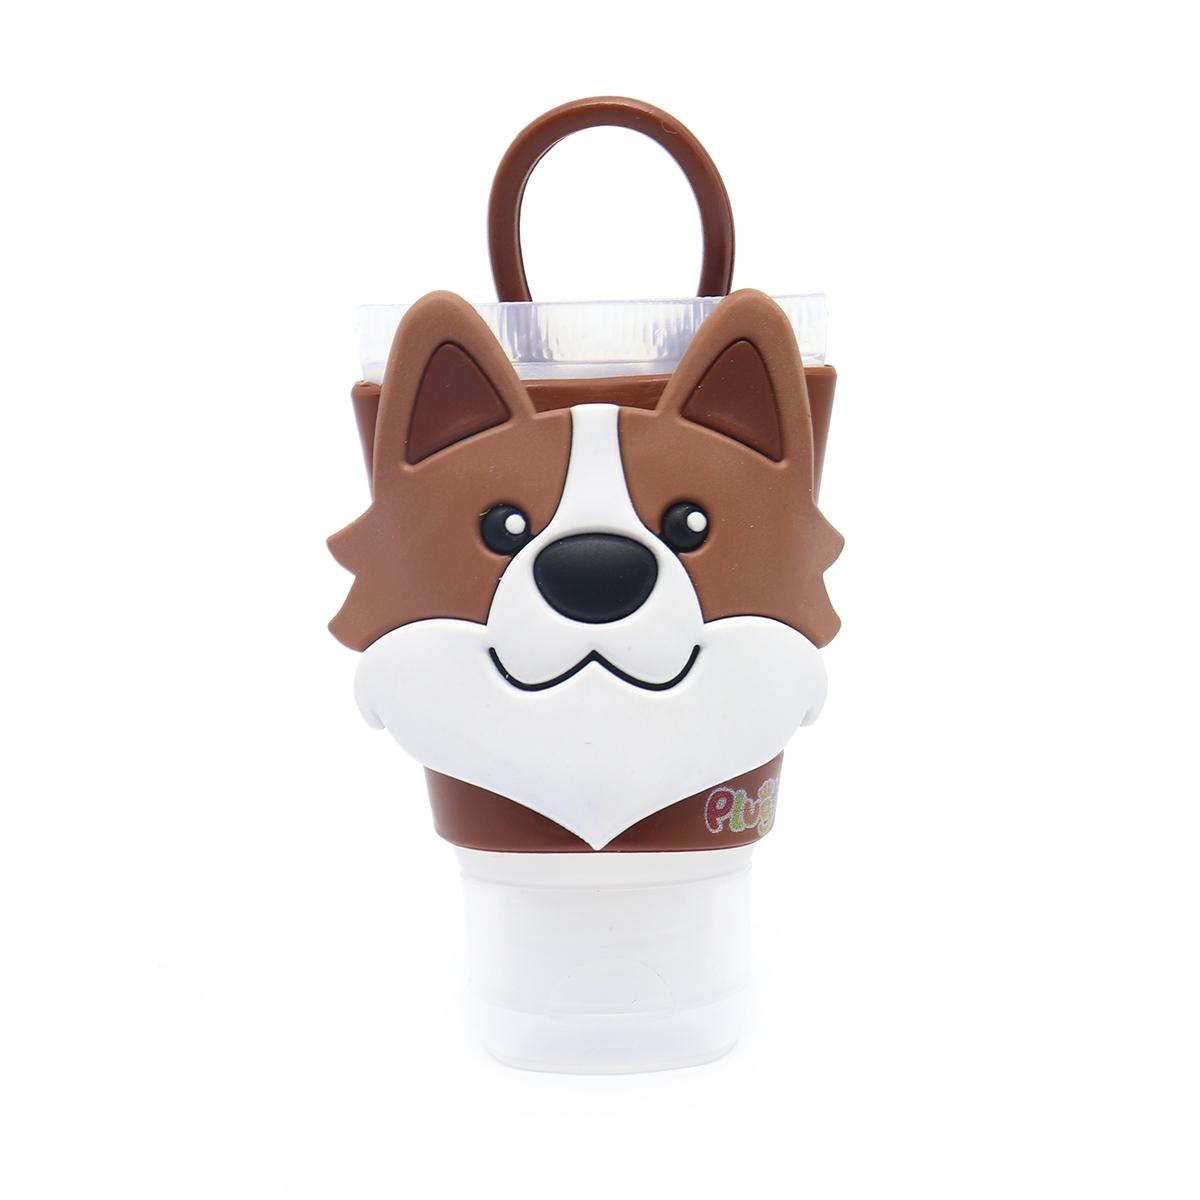 Chaveiro Plugt Cachorro Corgi Marrom + Frasco 30ml